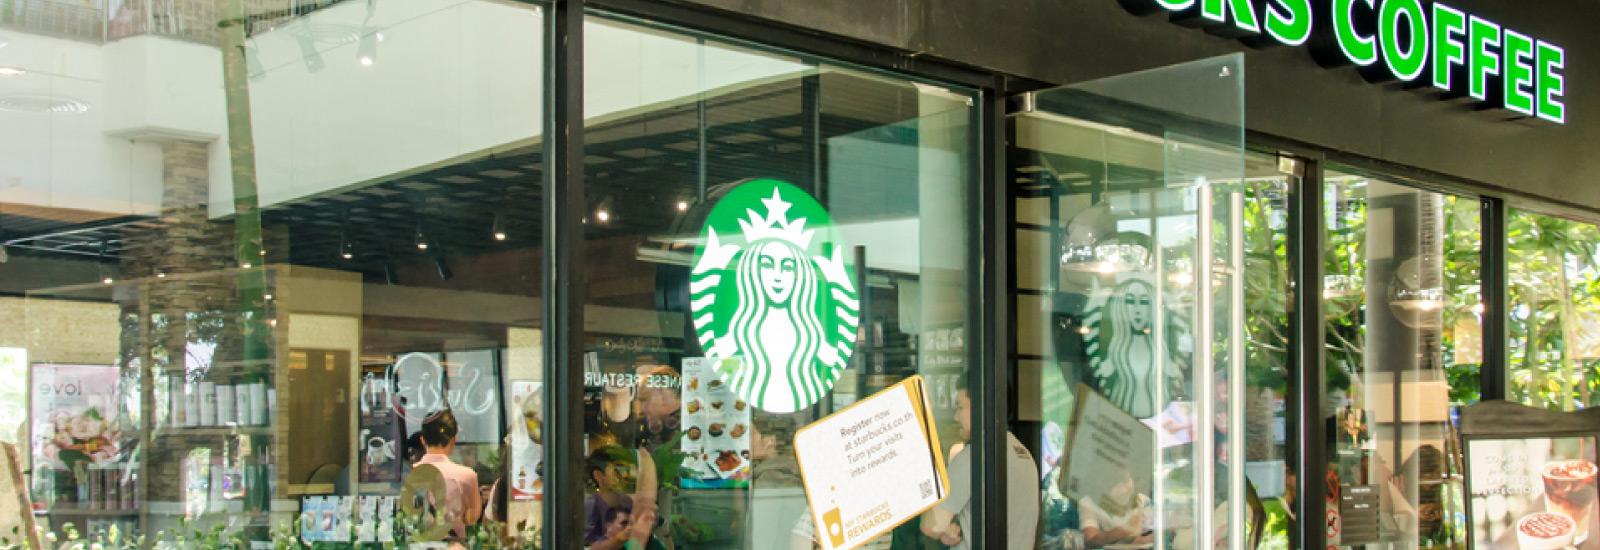 Starbucks - Main Exchange, Naval Base San Diego, CA